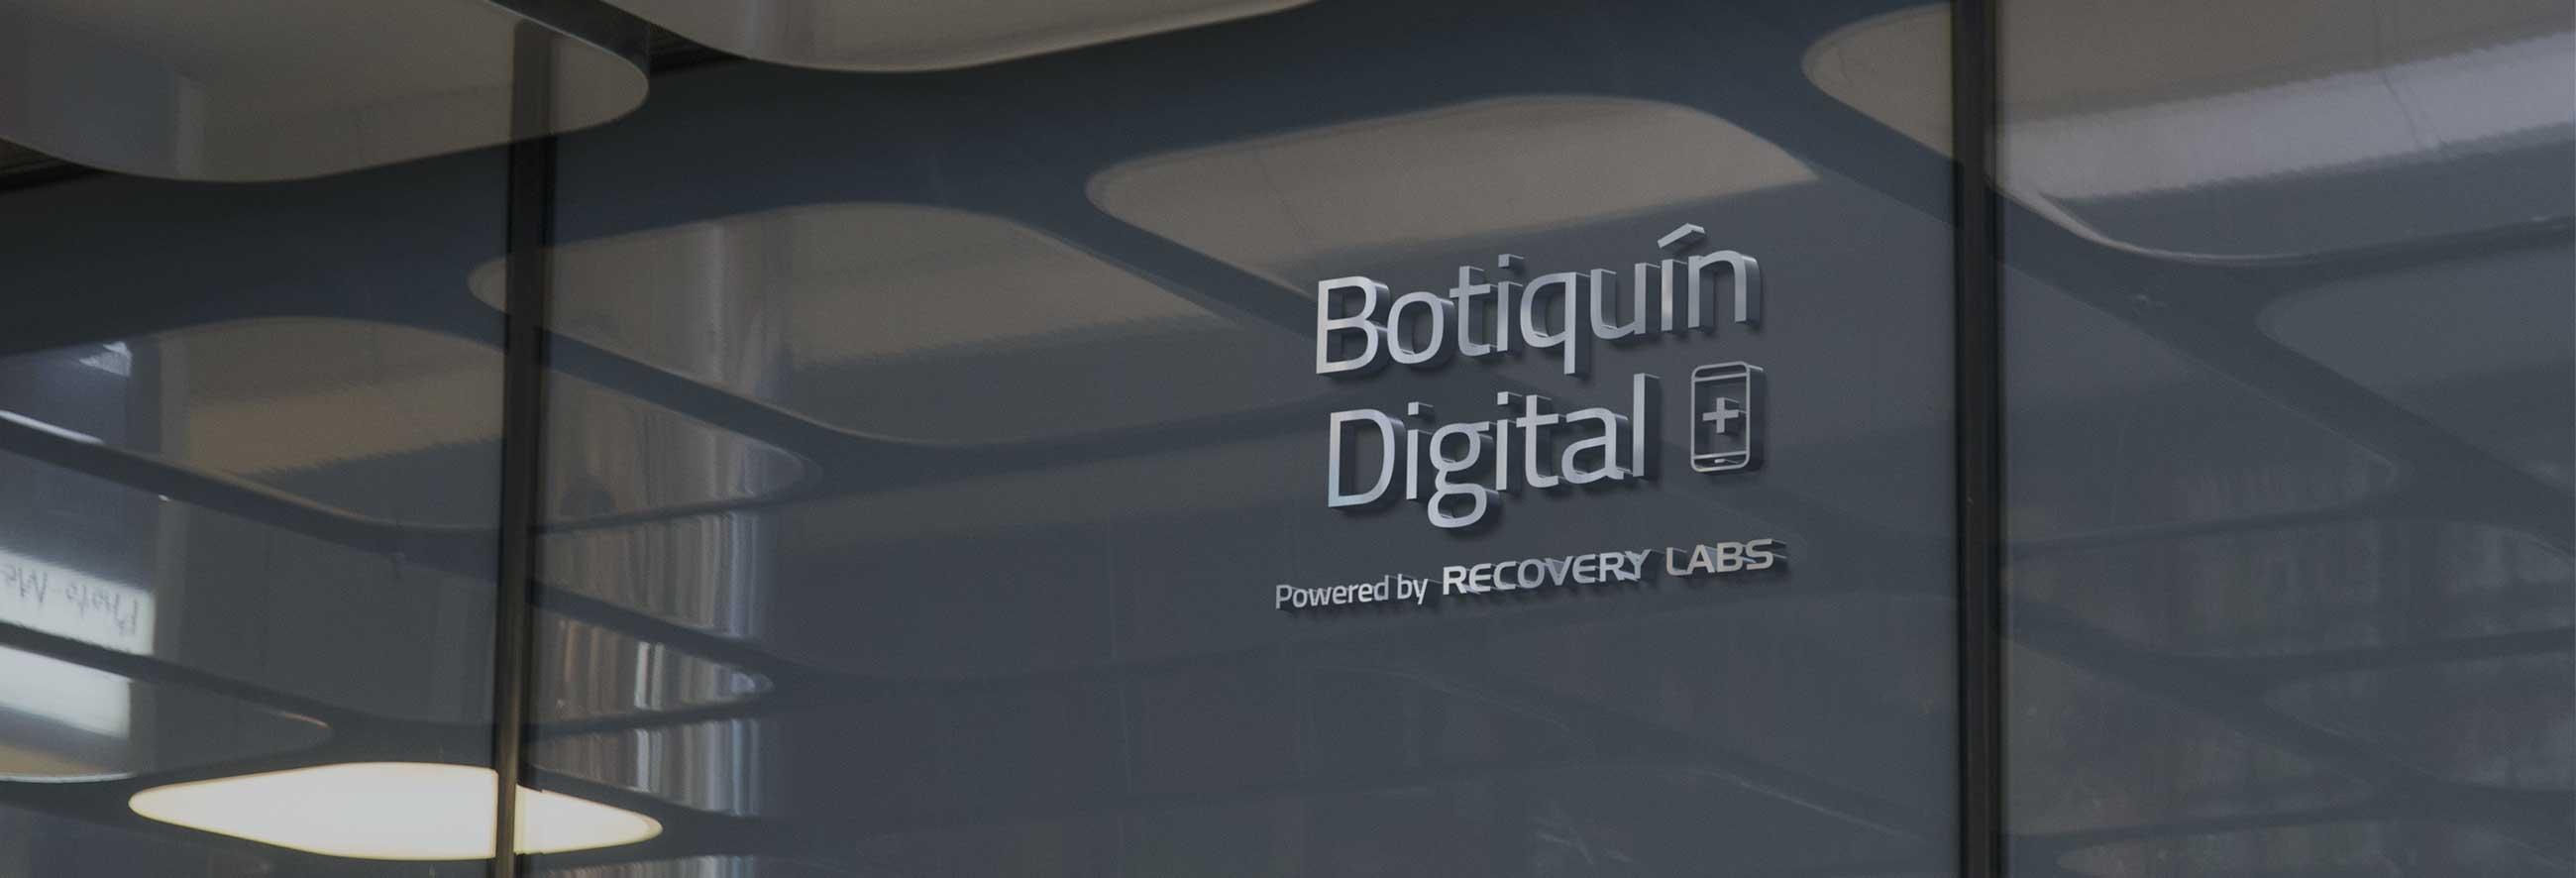 Botiquín Digital